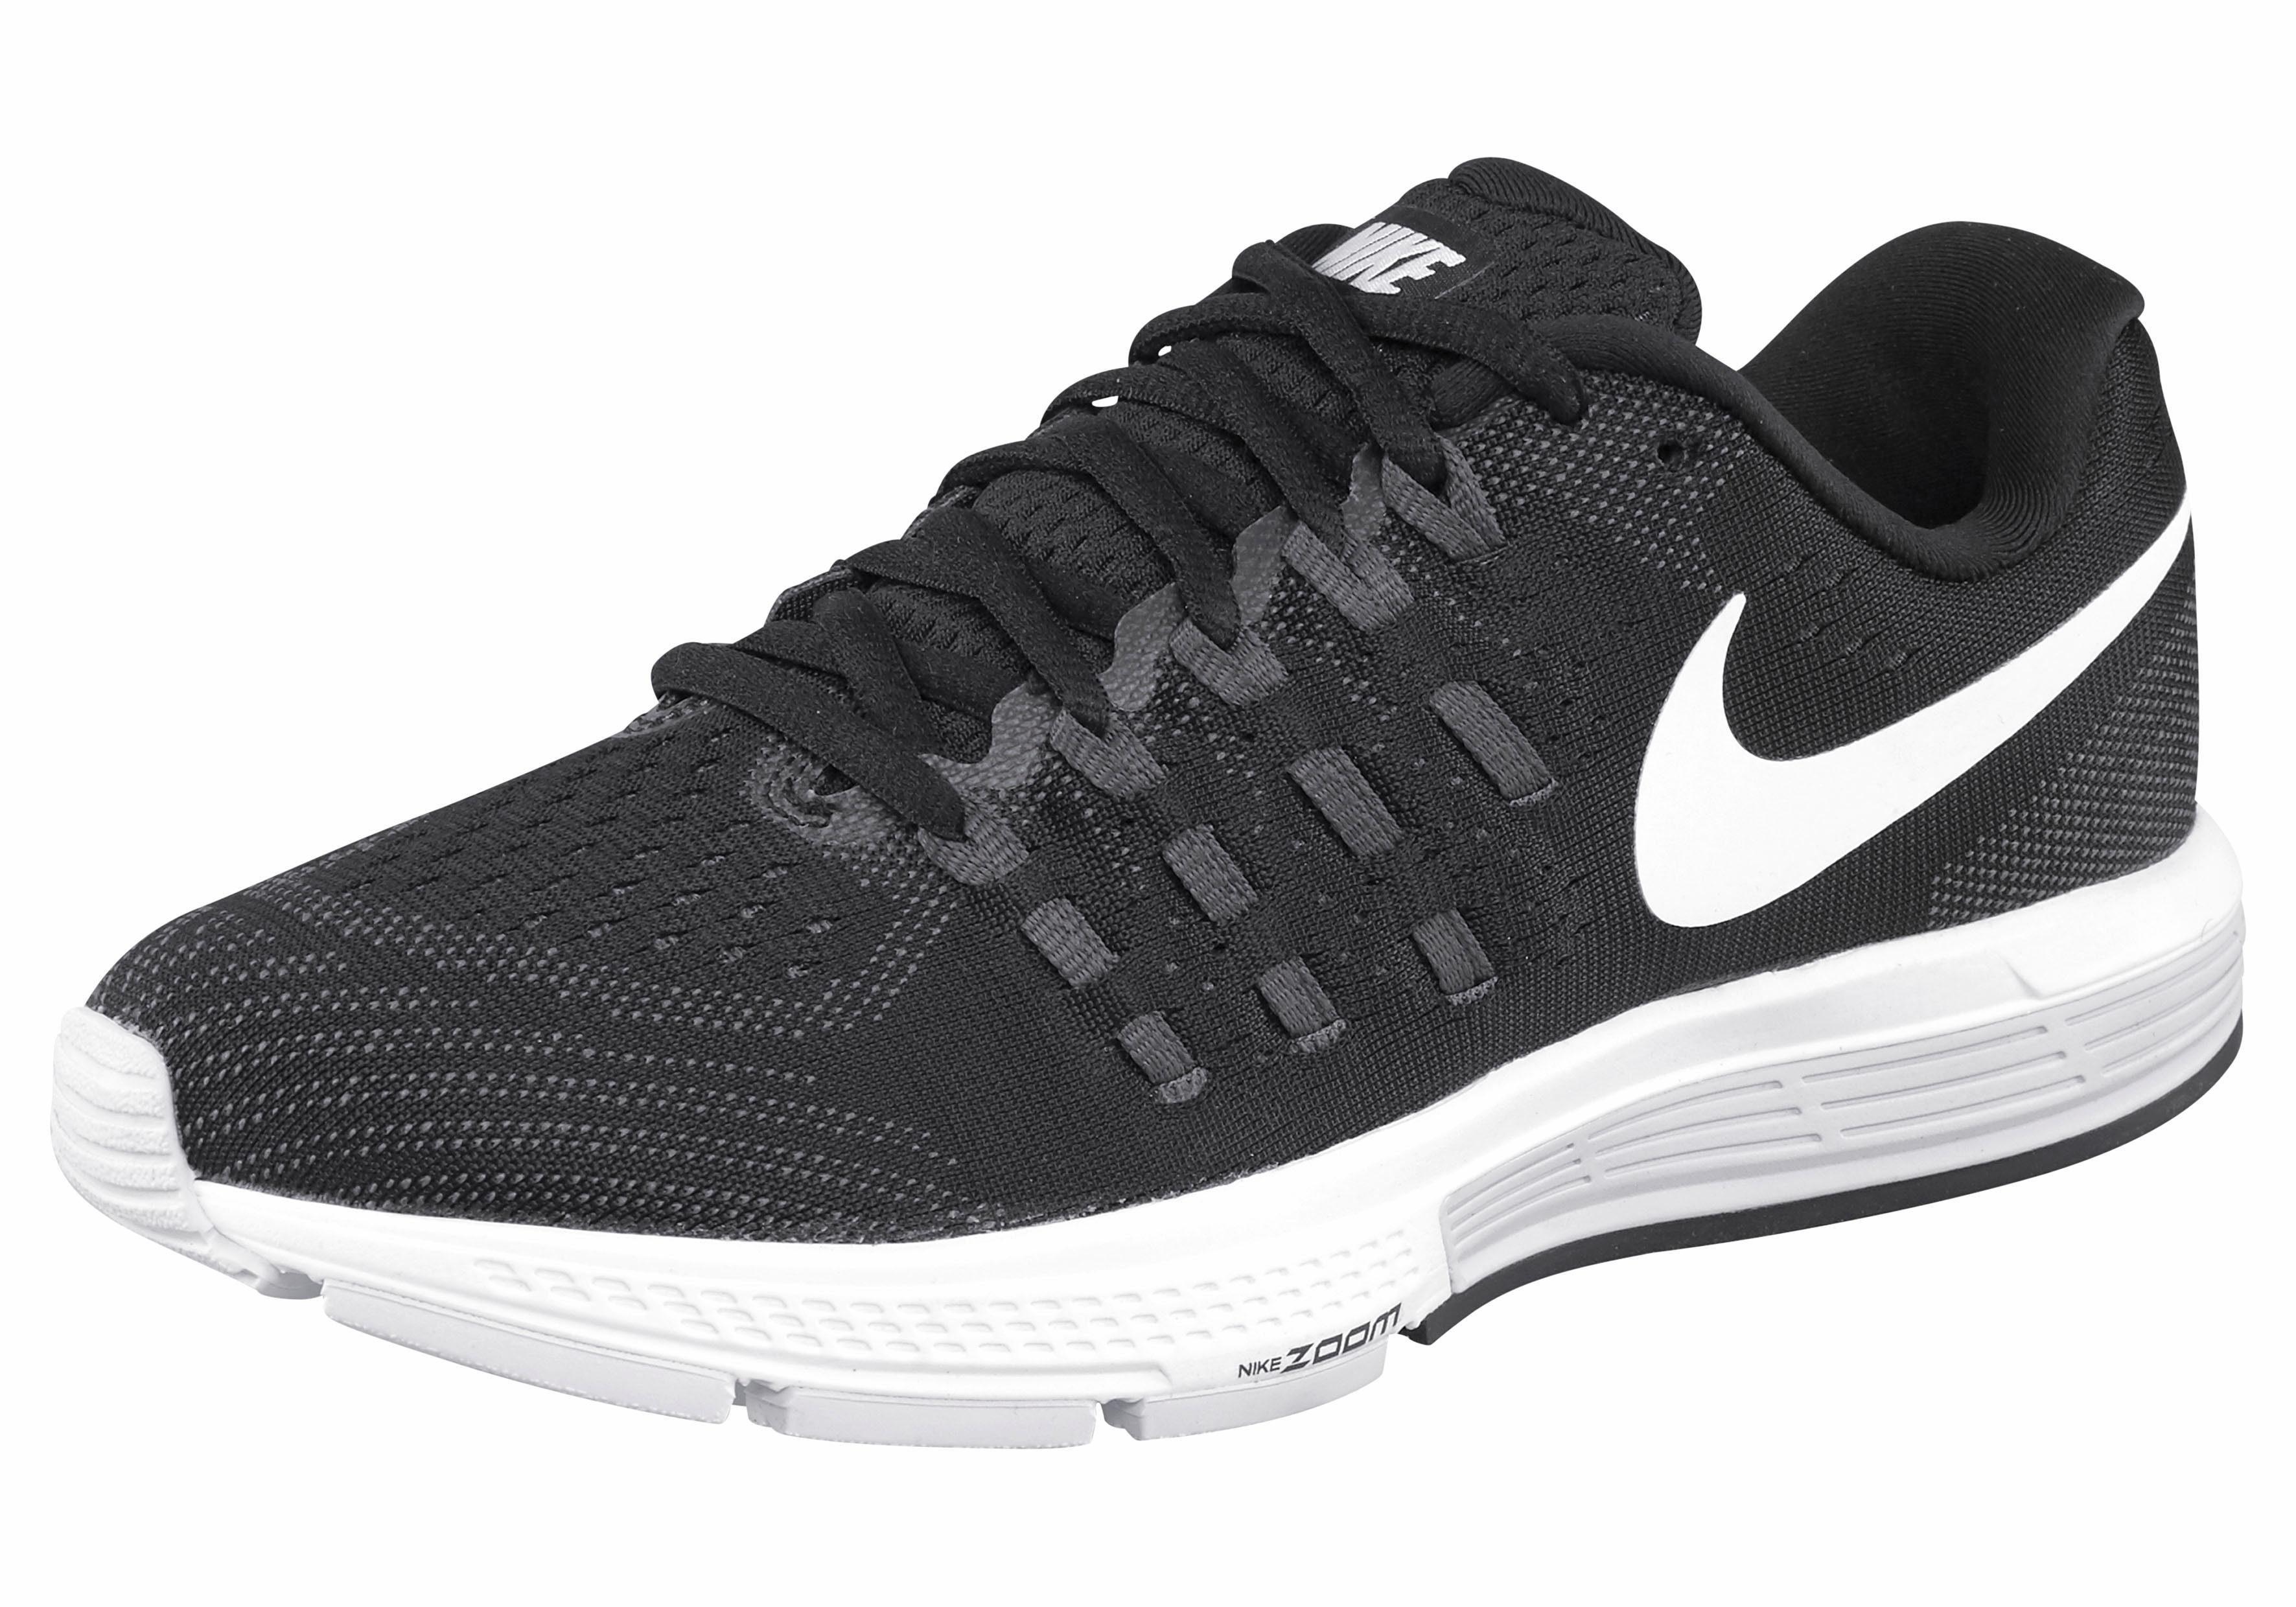 Nike »Air Zoom Vomero 11 Wmns« Laufschuh